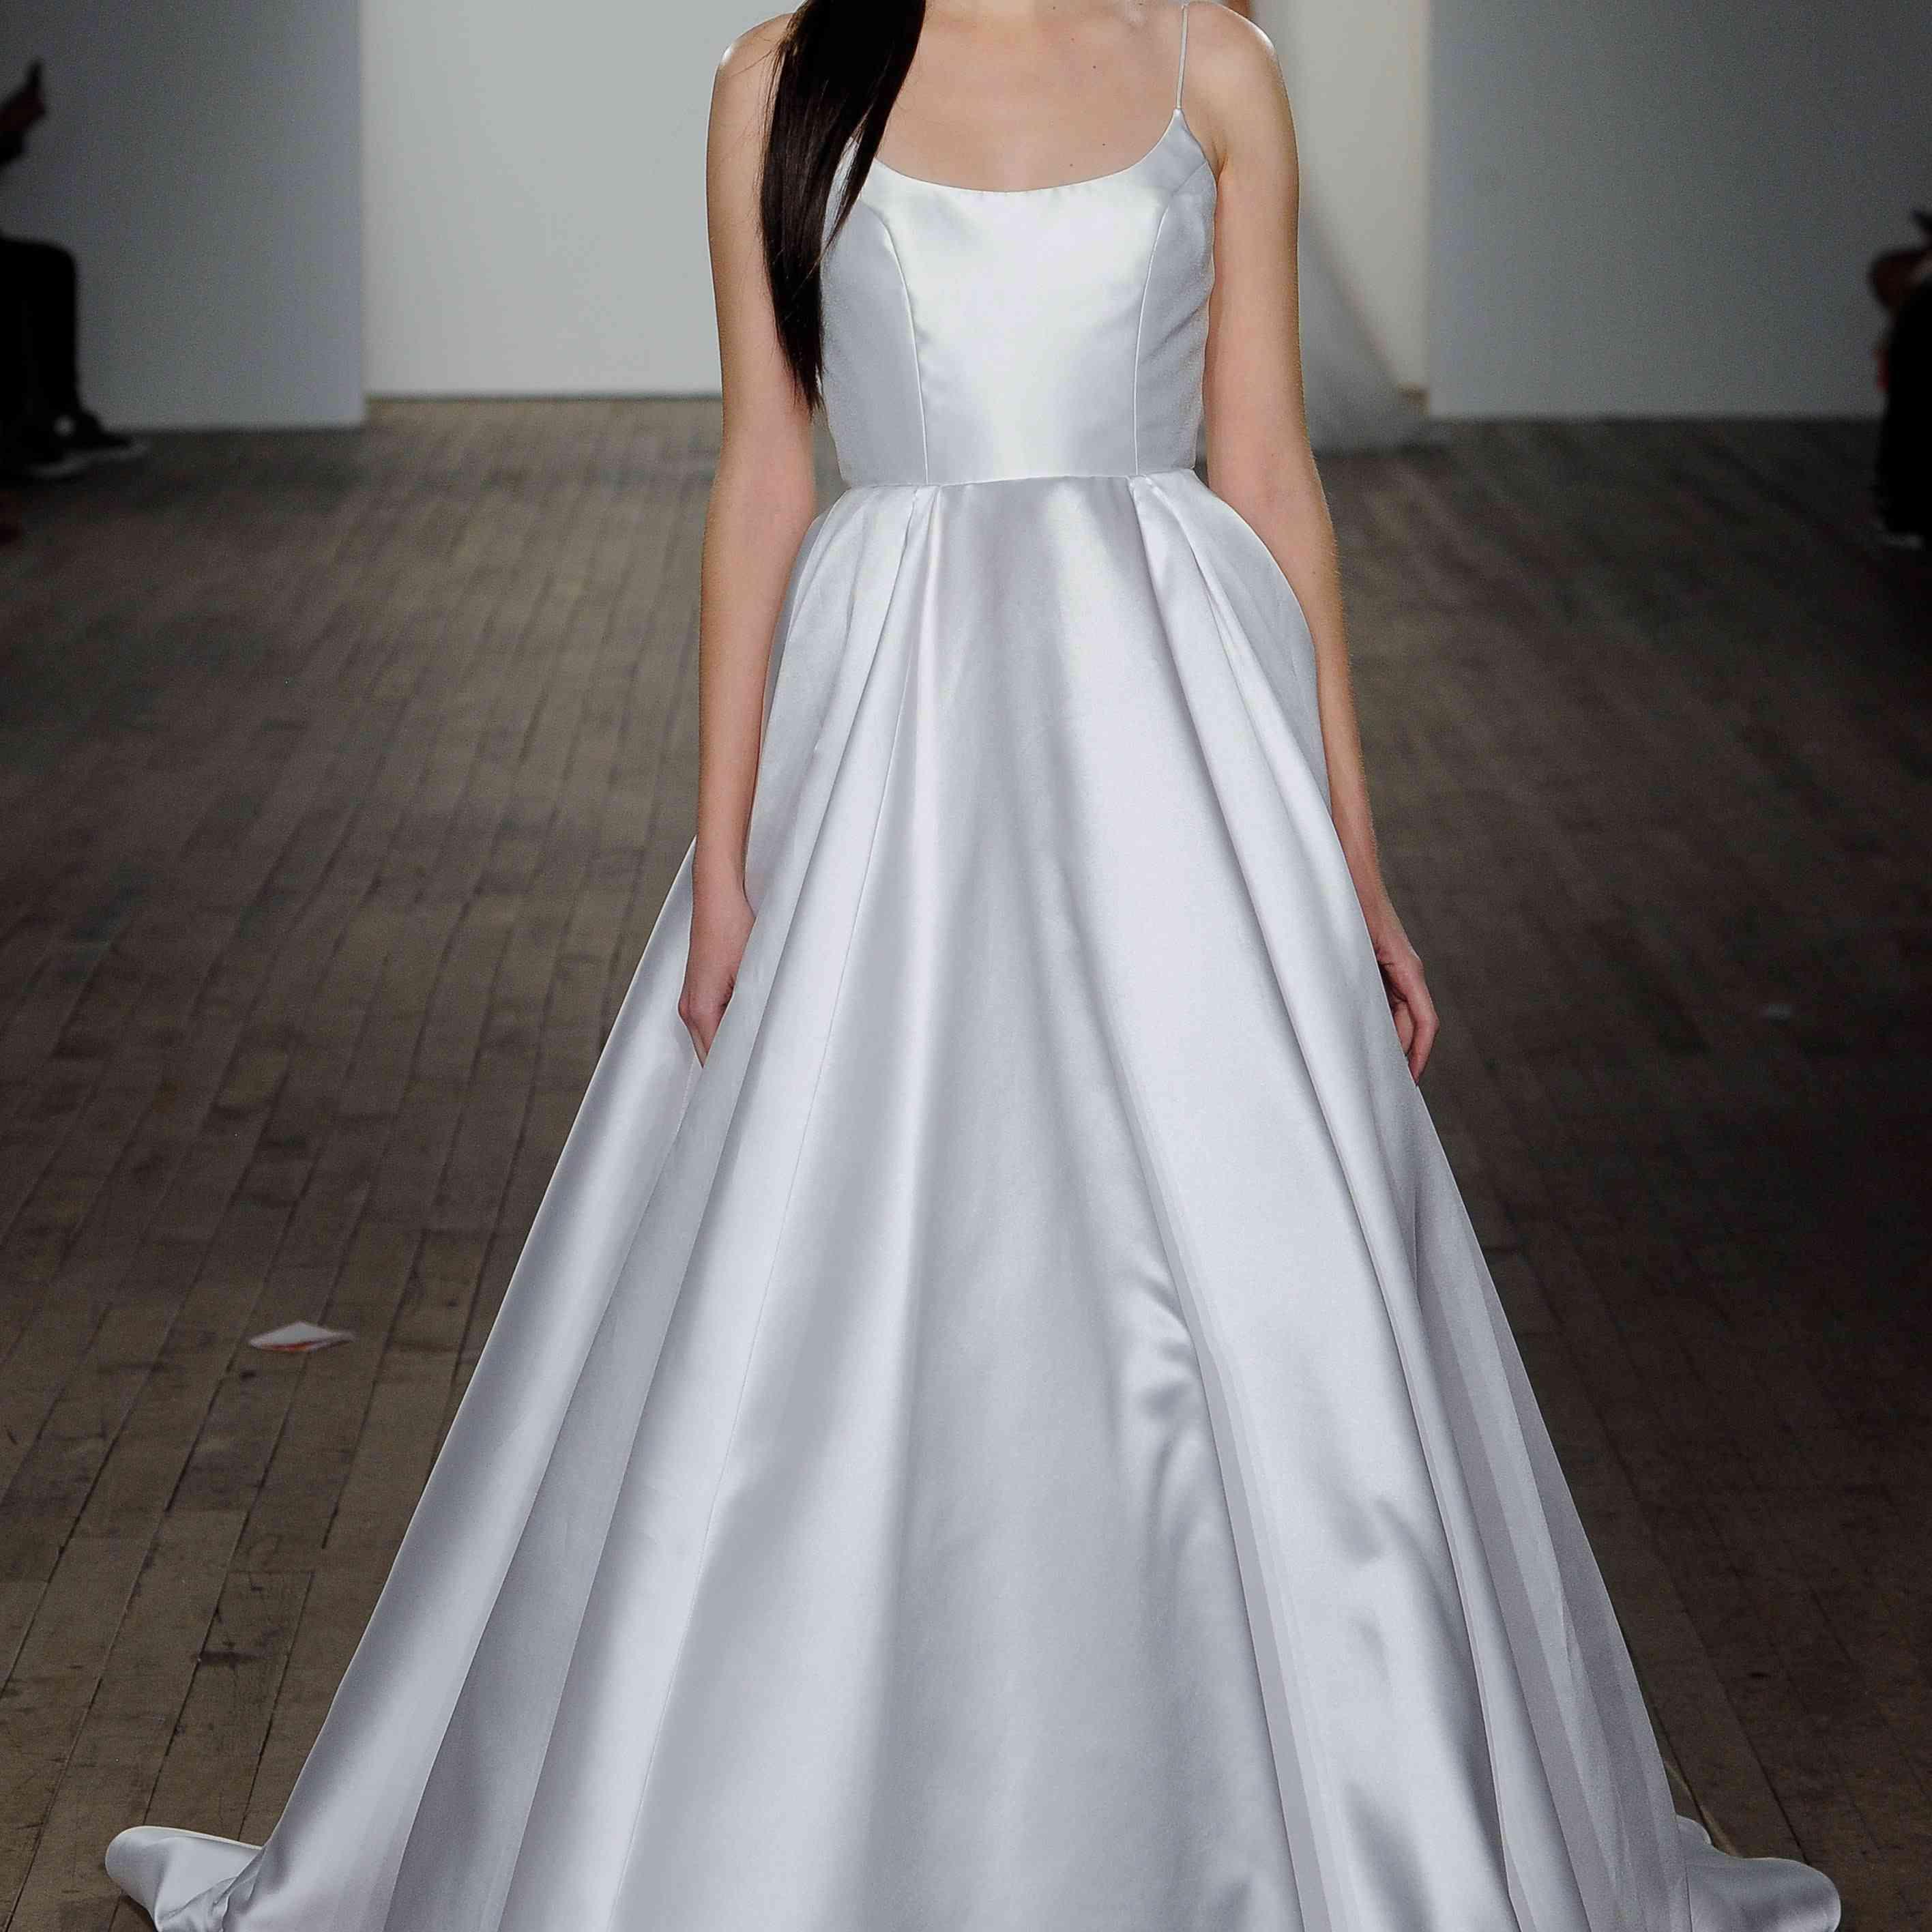 Vanna wedding ball gown